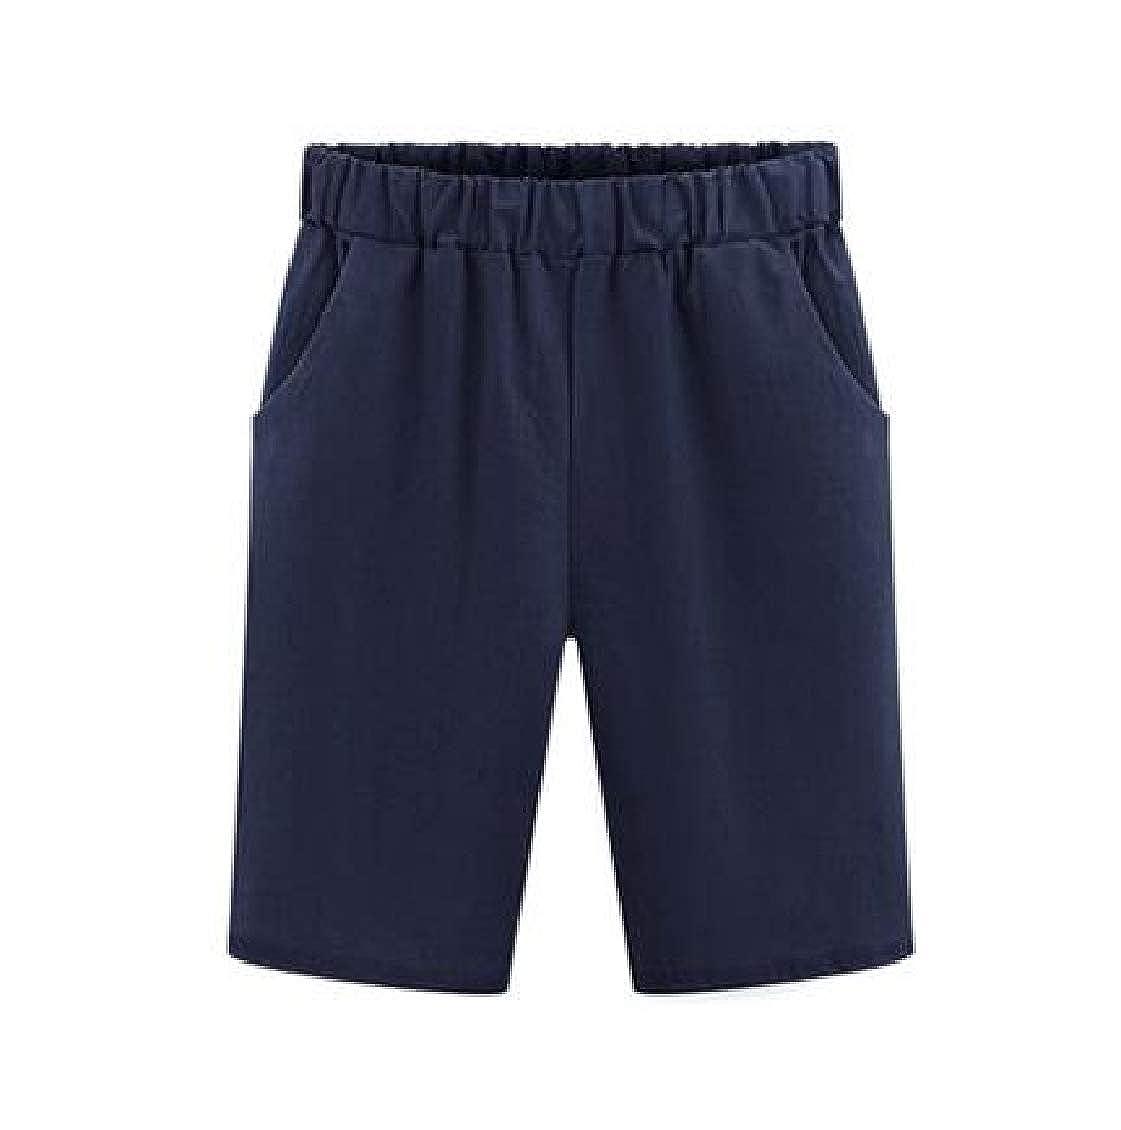 Spirio Womens Plus Size Solid Color Elastic Waist Harem Pants Casual Shorts